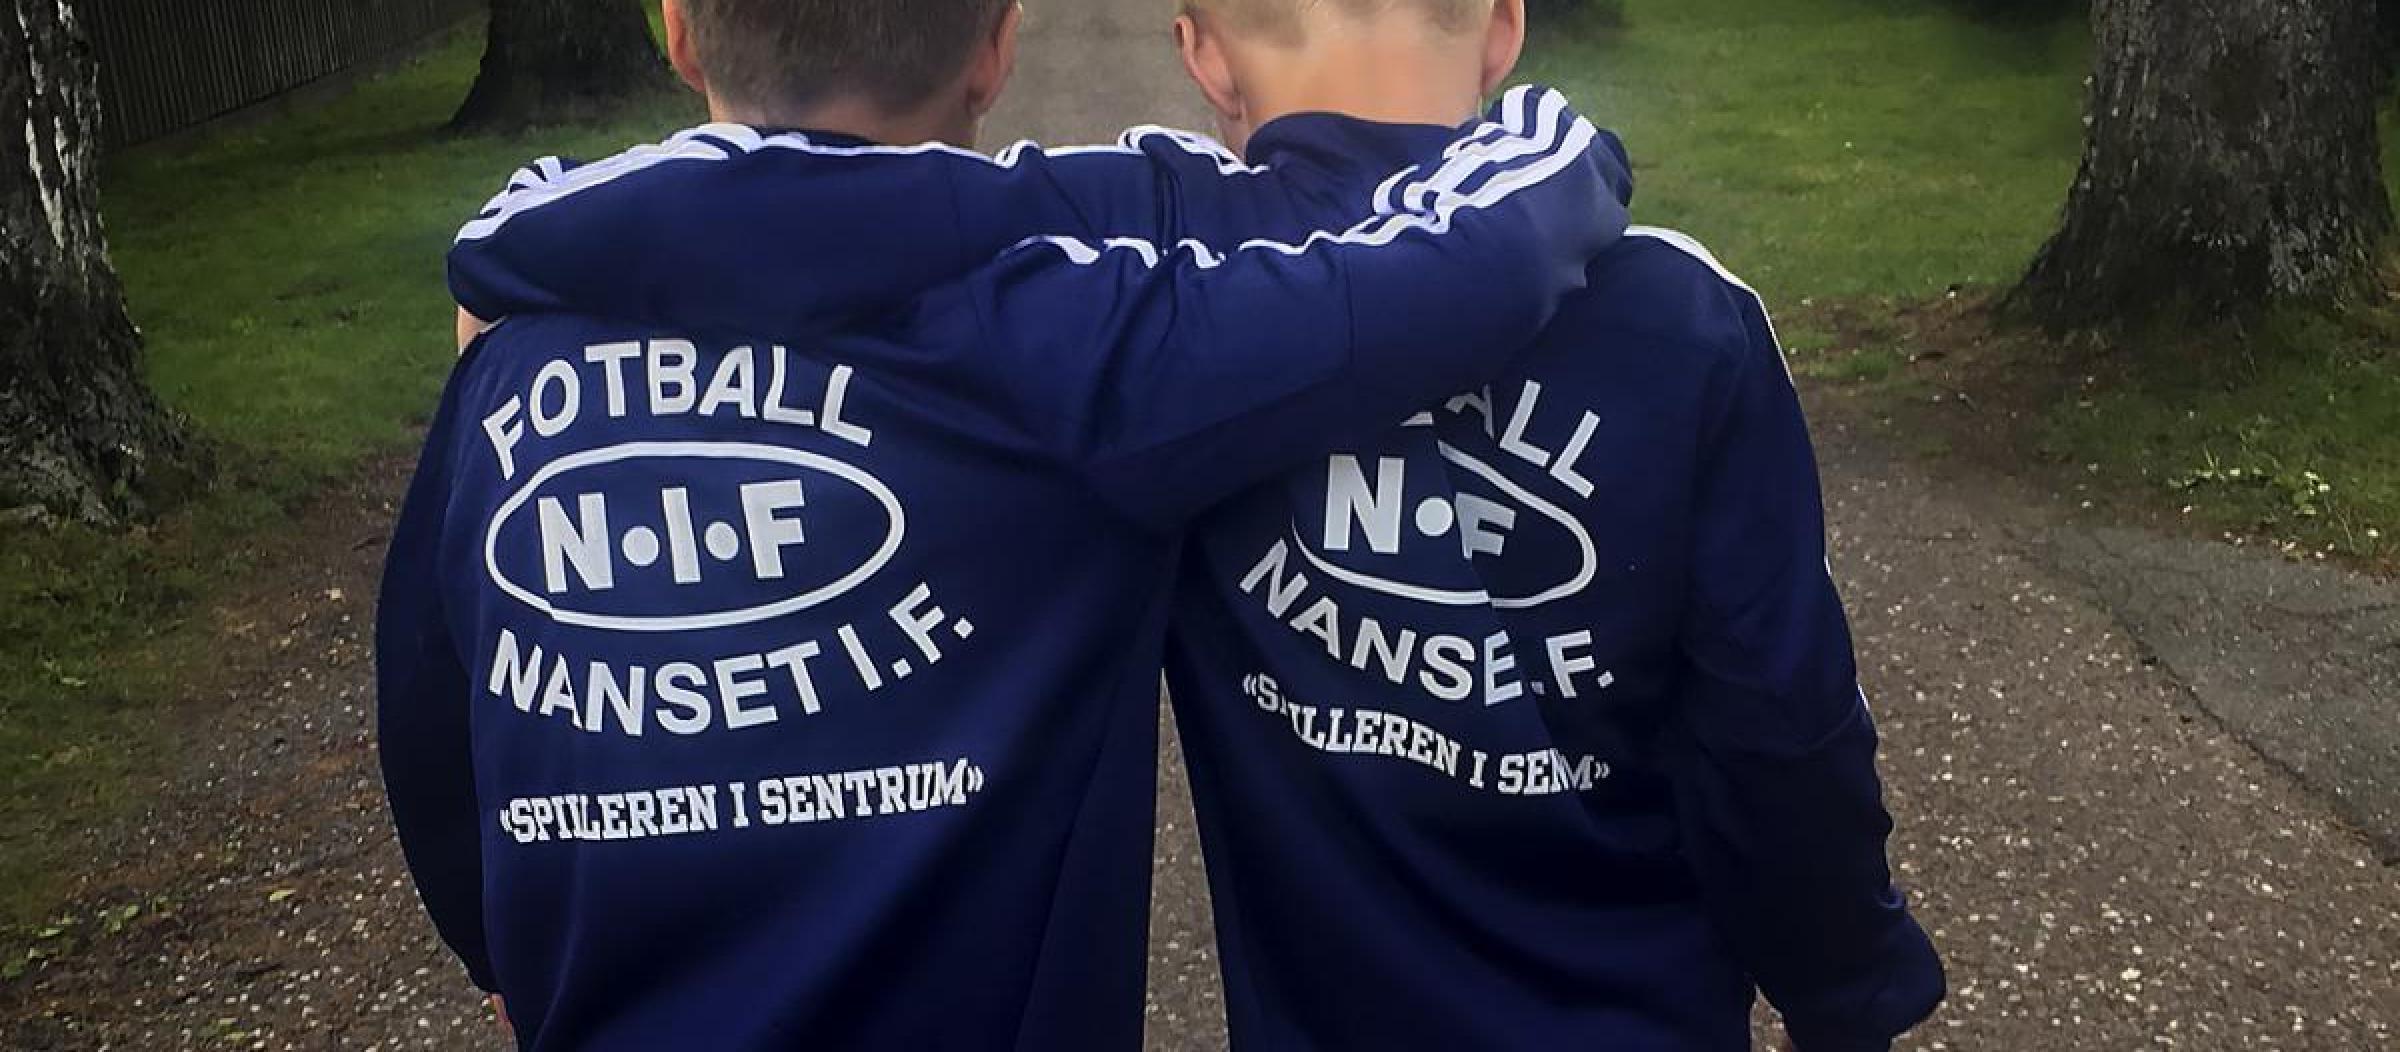 Nanset IF Fotball